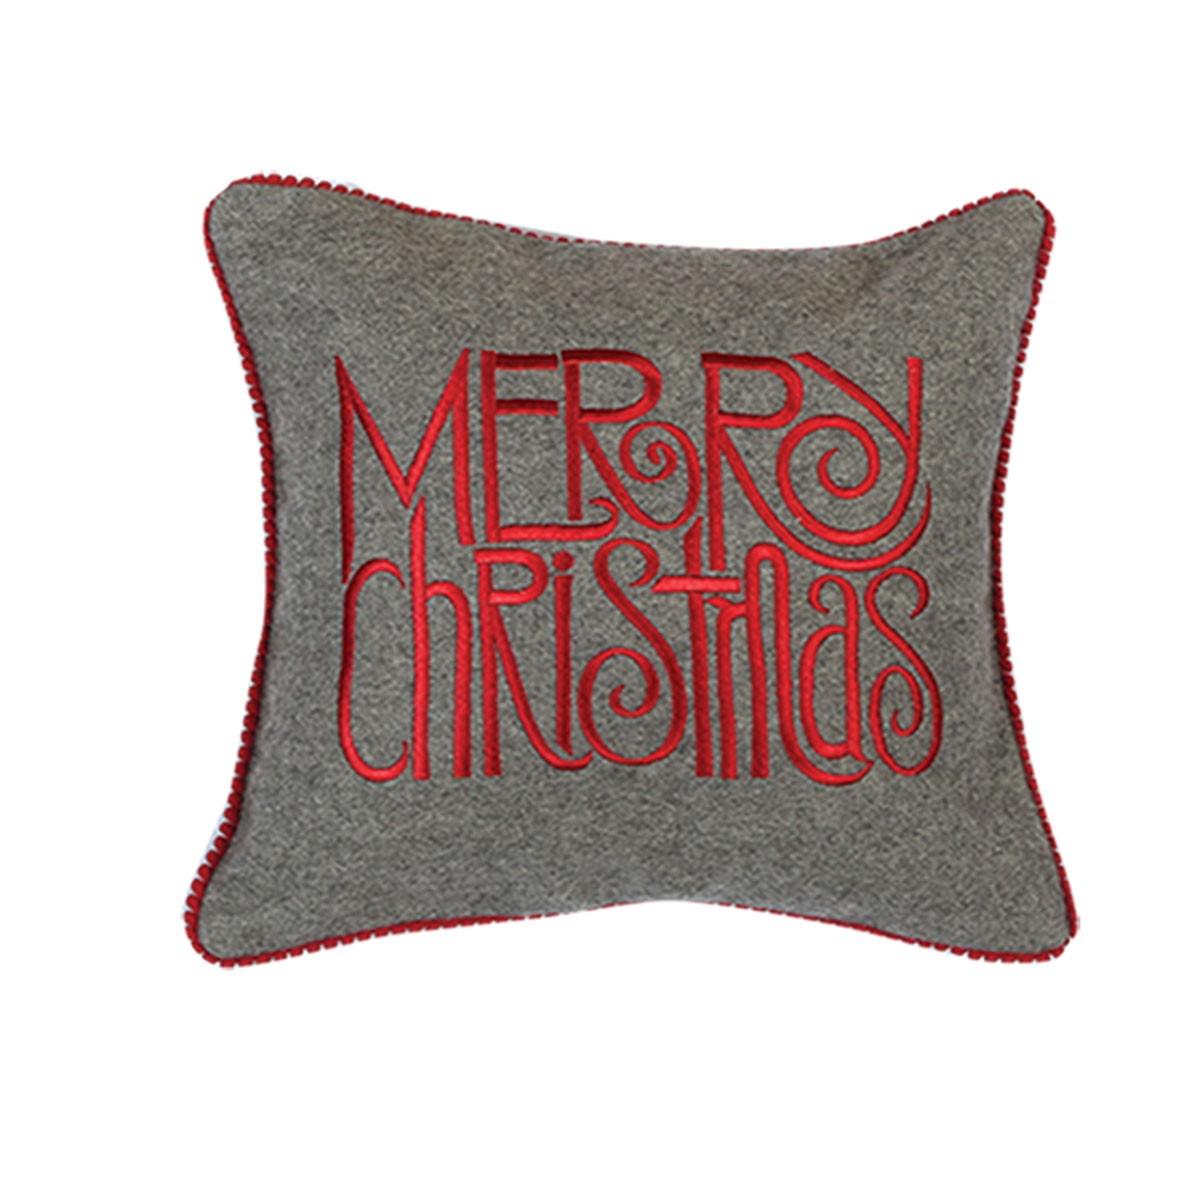 Nef – Nef * Χριστουγεννιάτικο Μαξιλαράκι Nef-Nef Xmas Merry Christmas